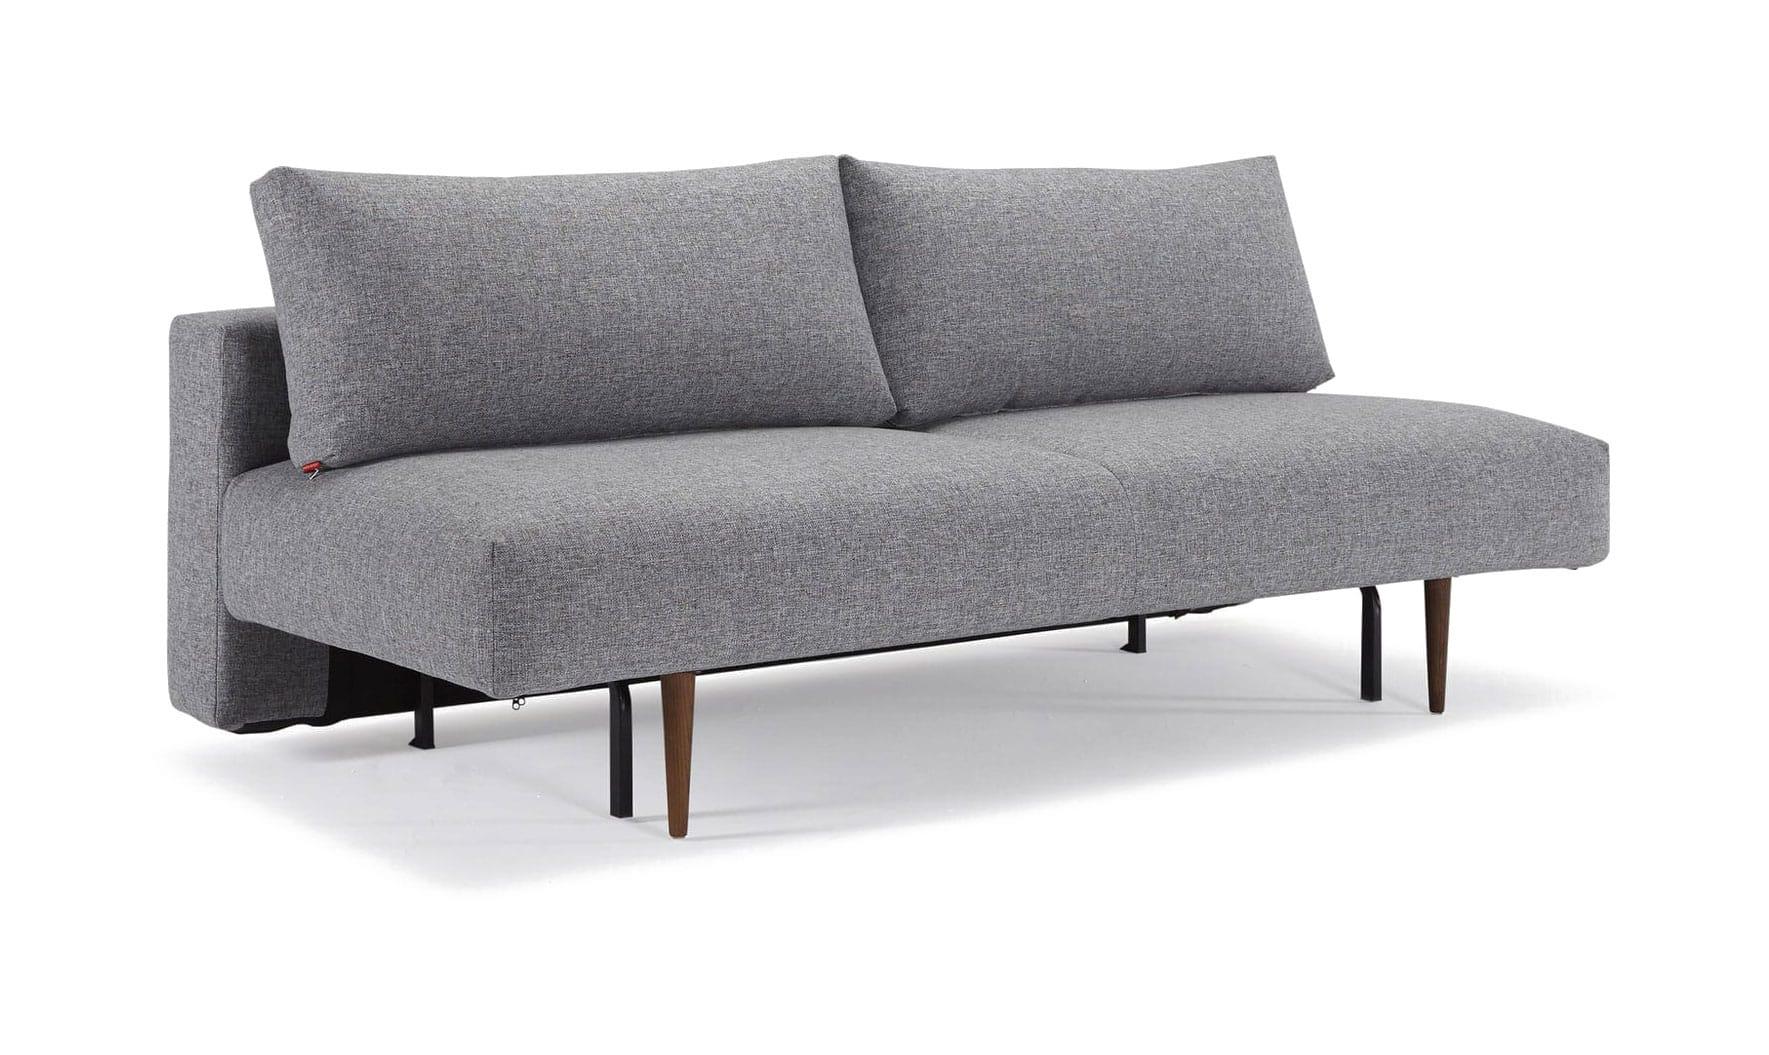 Pleasing Frode Sofa Twist Granite By Innovation Inzonedesignstudio Interior Chair Design Inzonedesignstudiocom